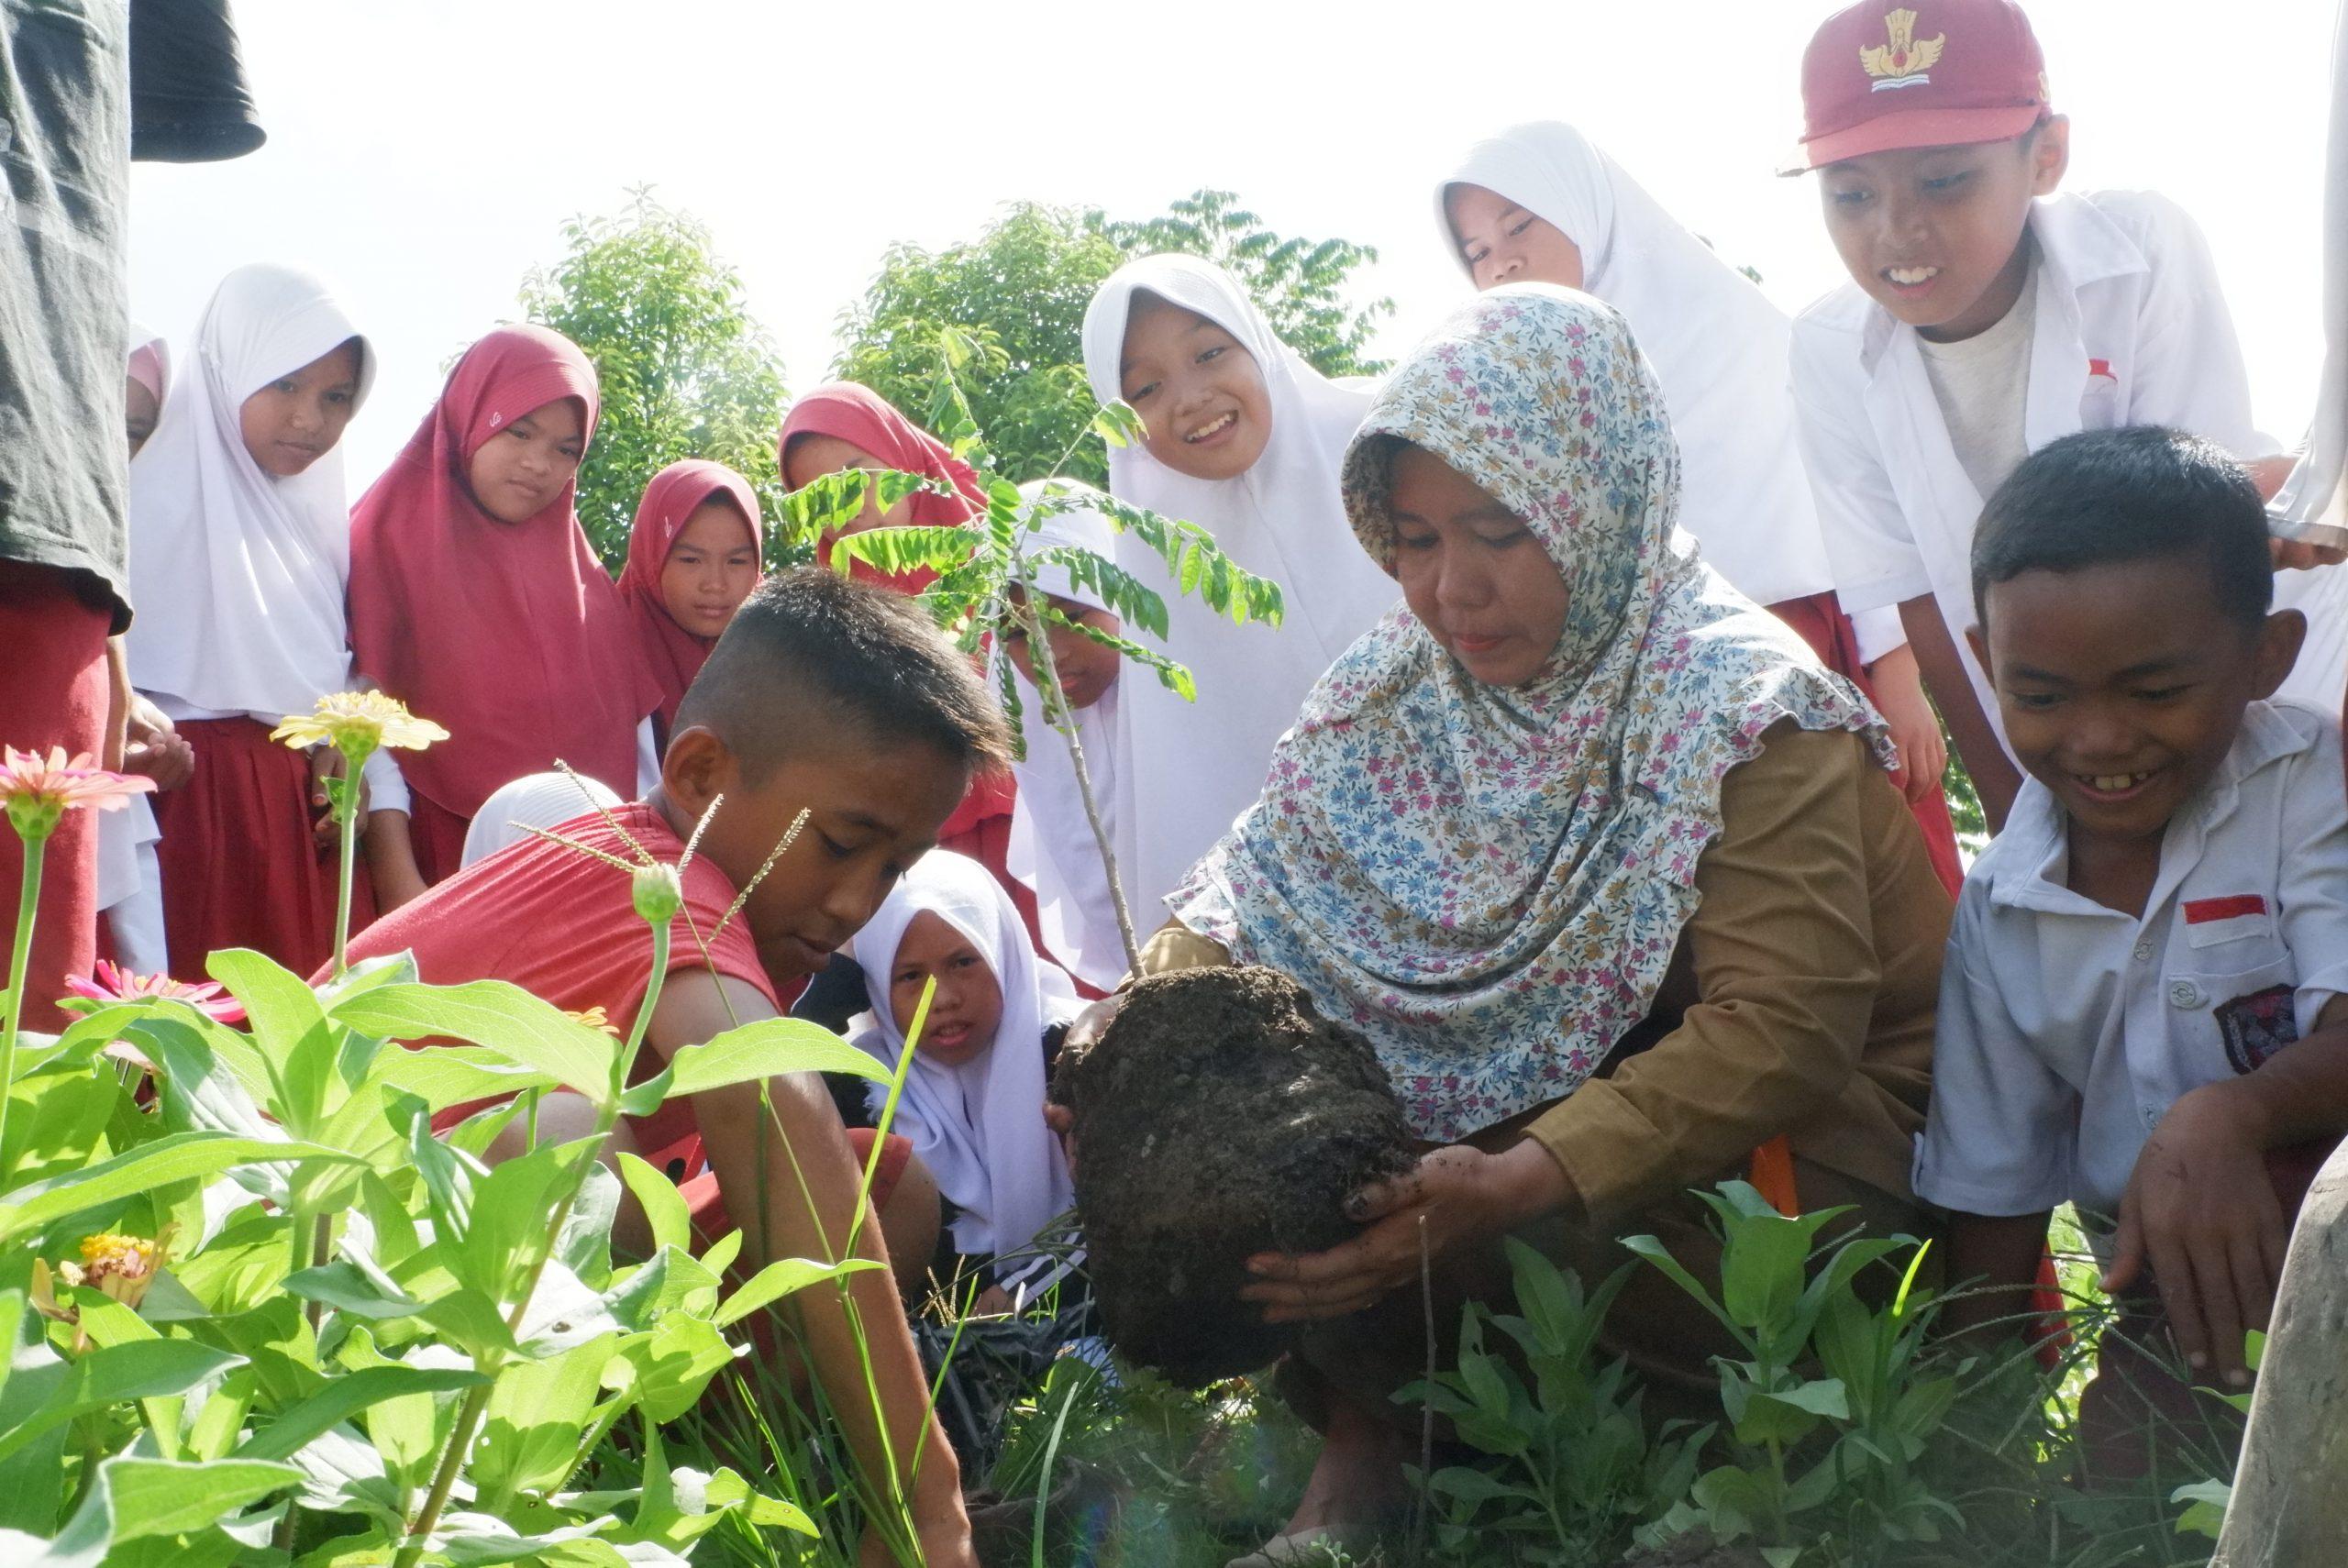 Nusantara-Pembina duta mengajak anak-anak berkebun